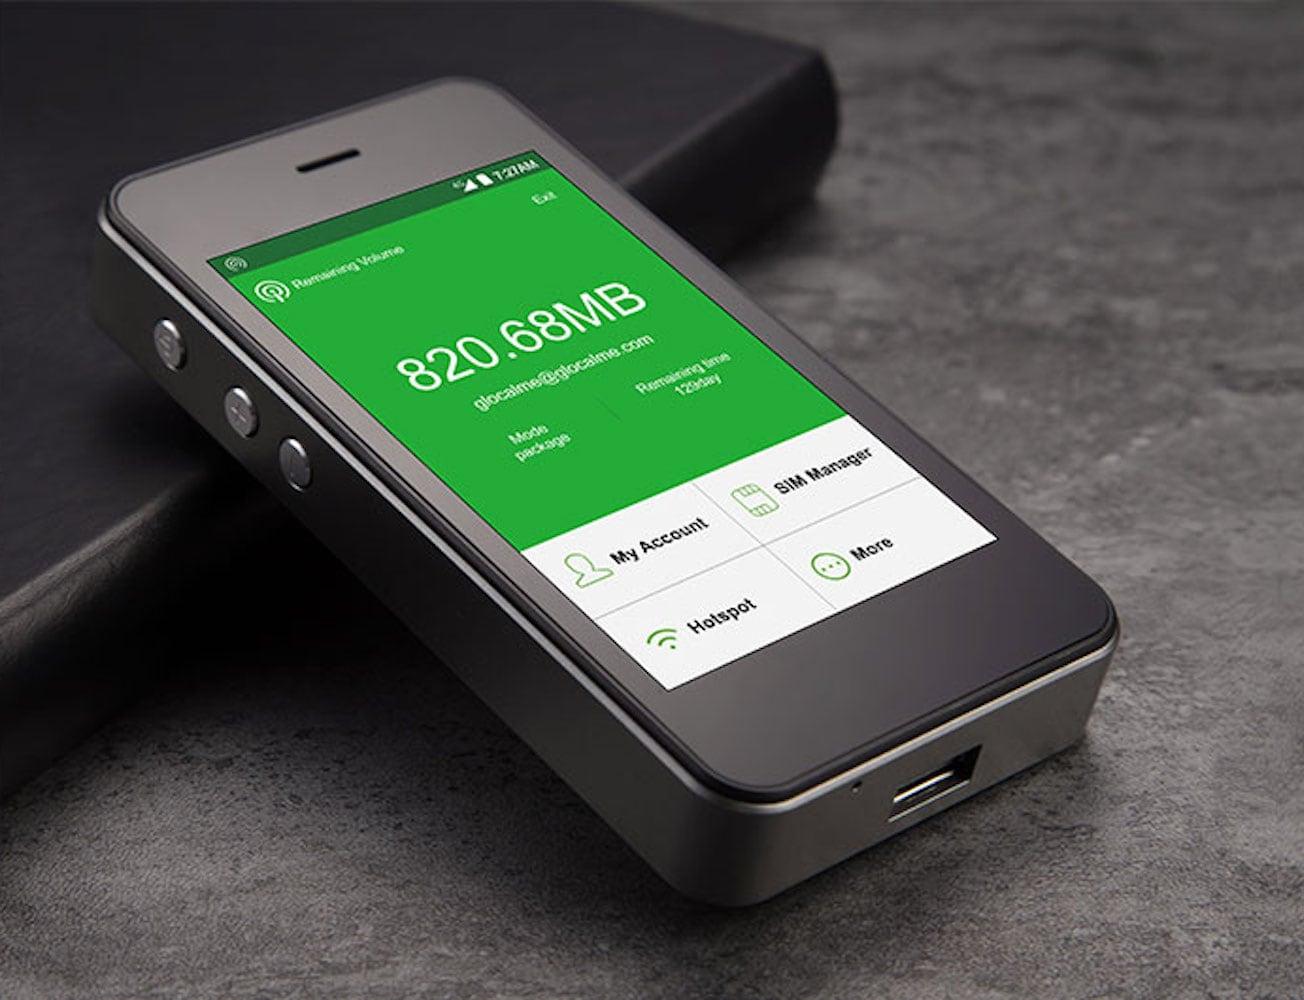 GlocalMe G3 Secure Mobile WiFi Hotspot